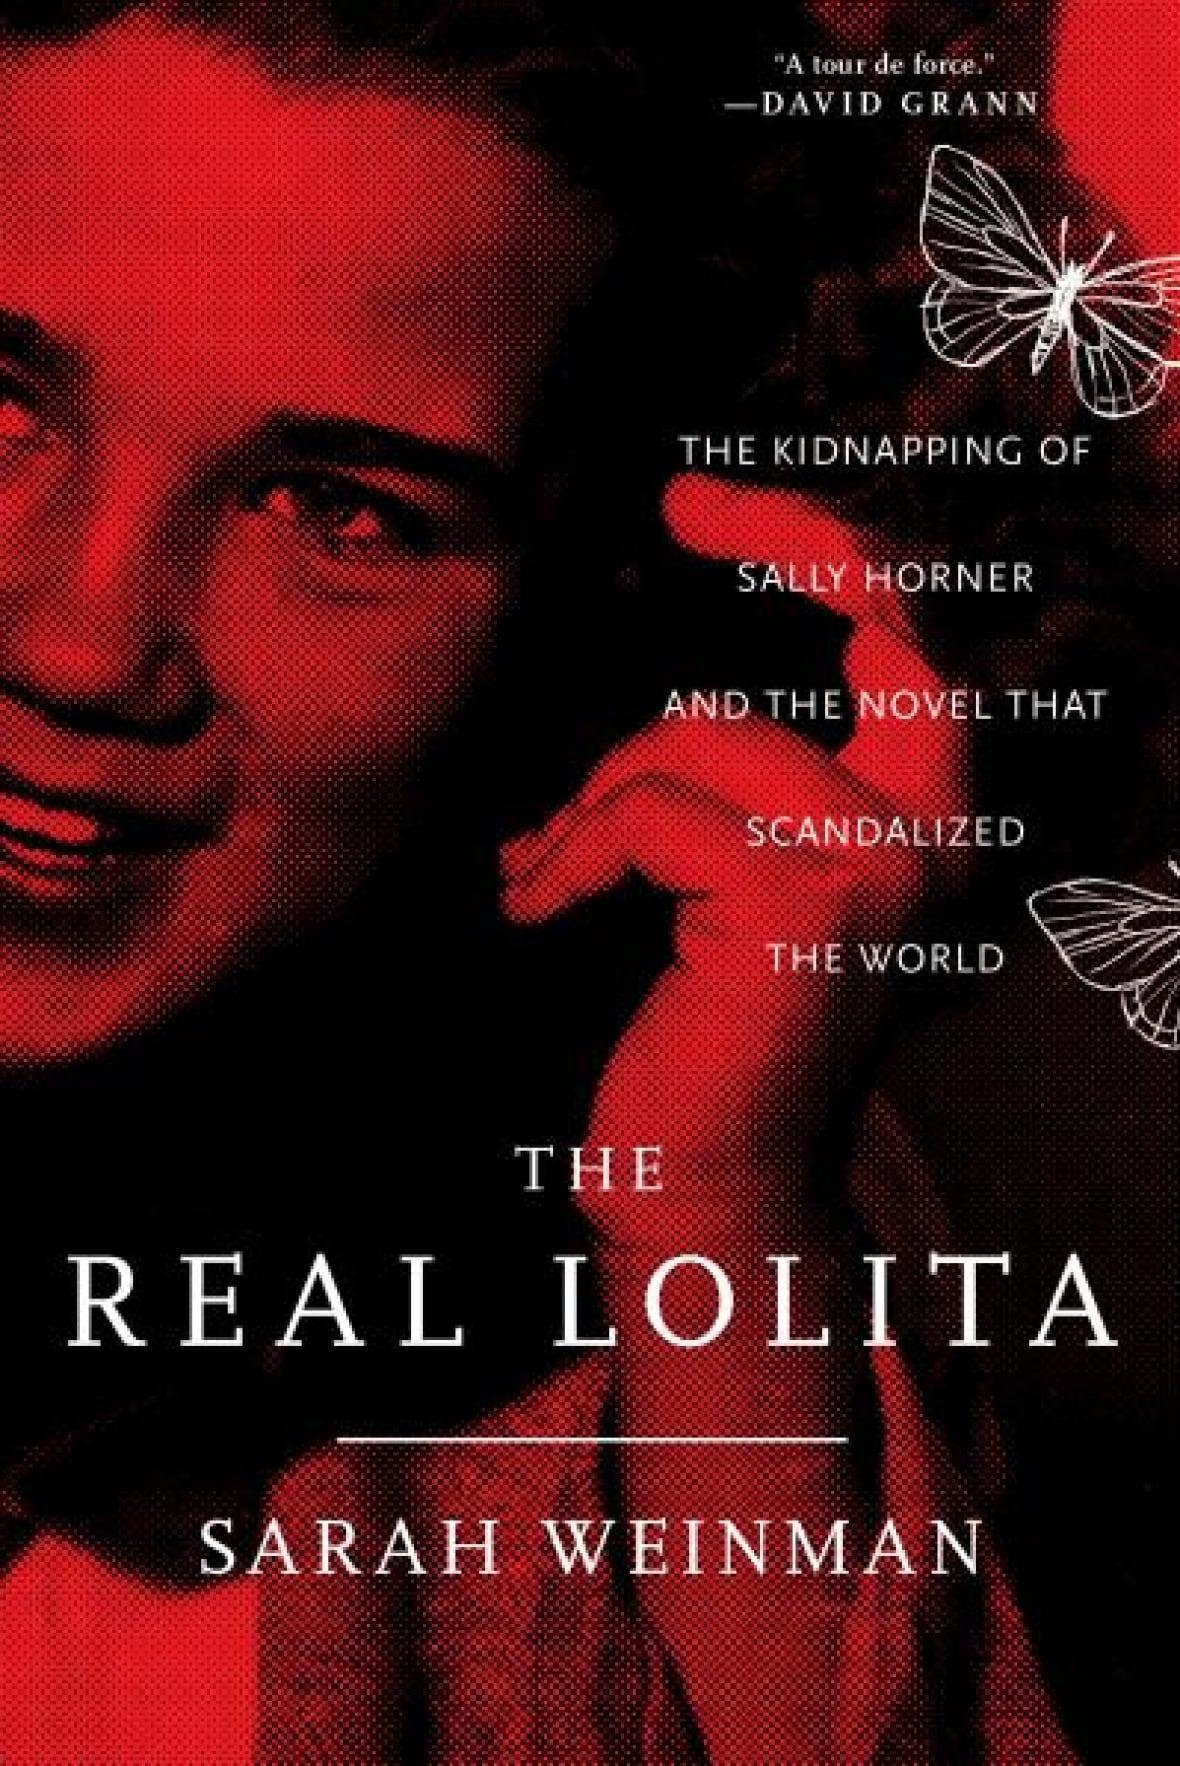 The Real Lolita (Audiobook) - Walmart.com